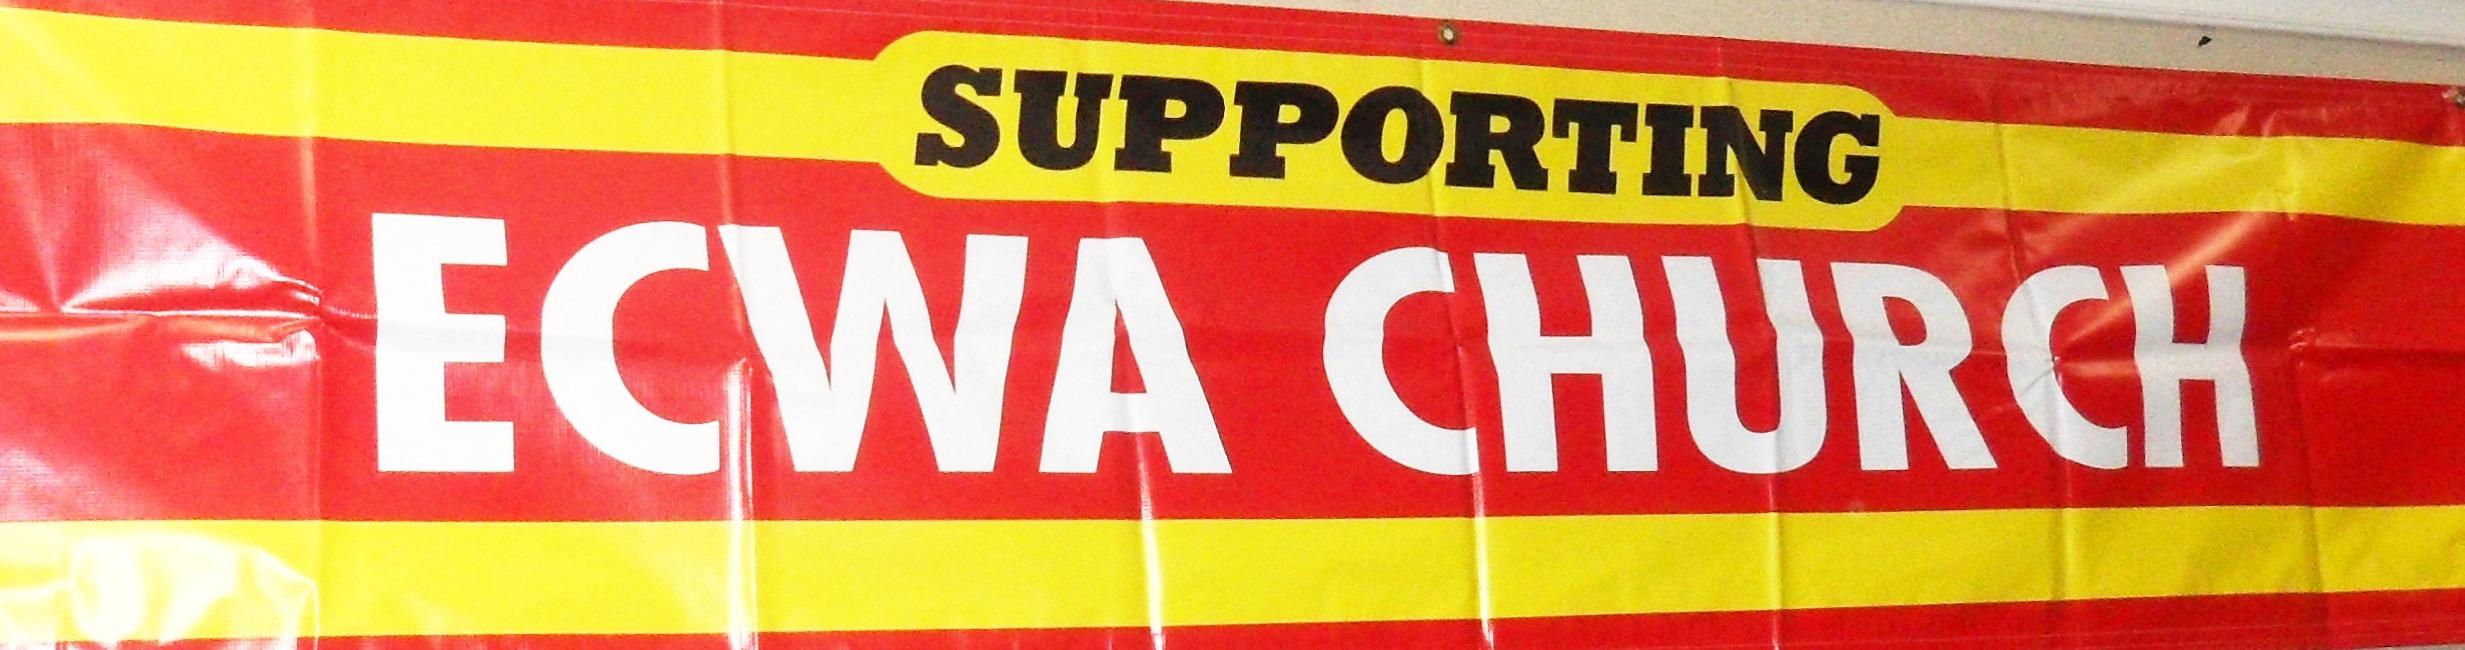 Supporting ECWA Church